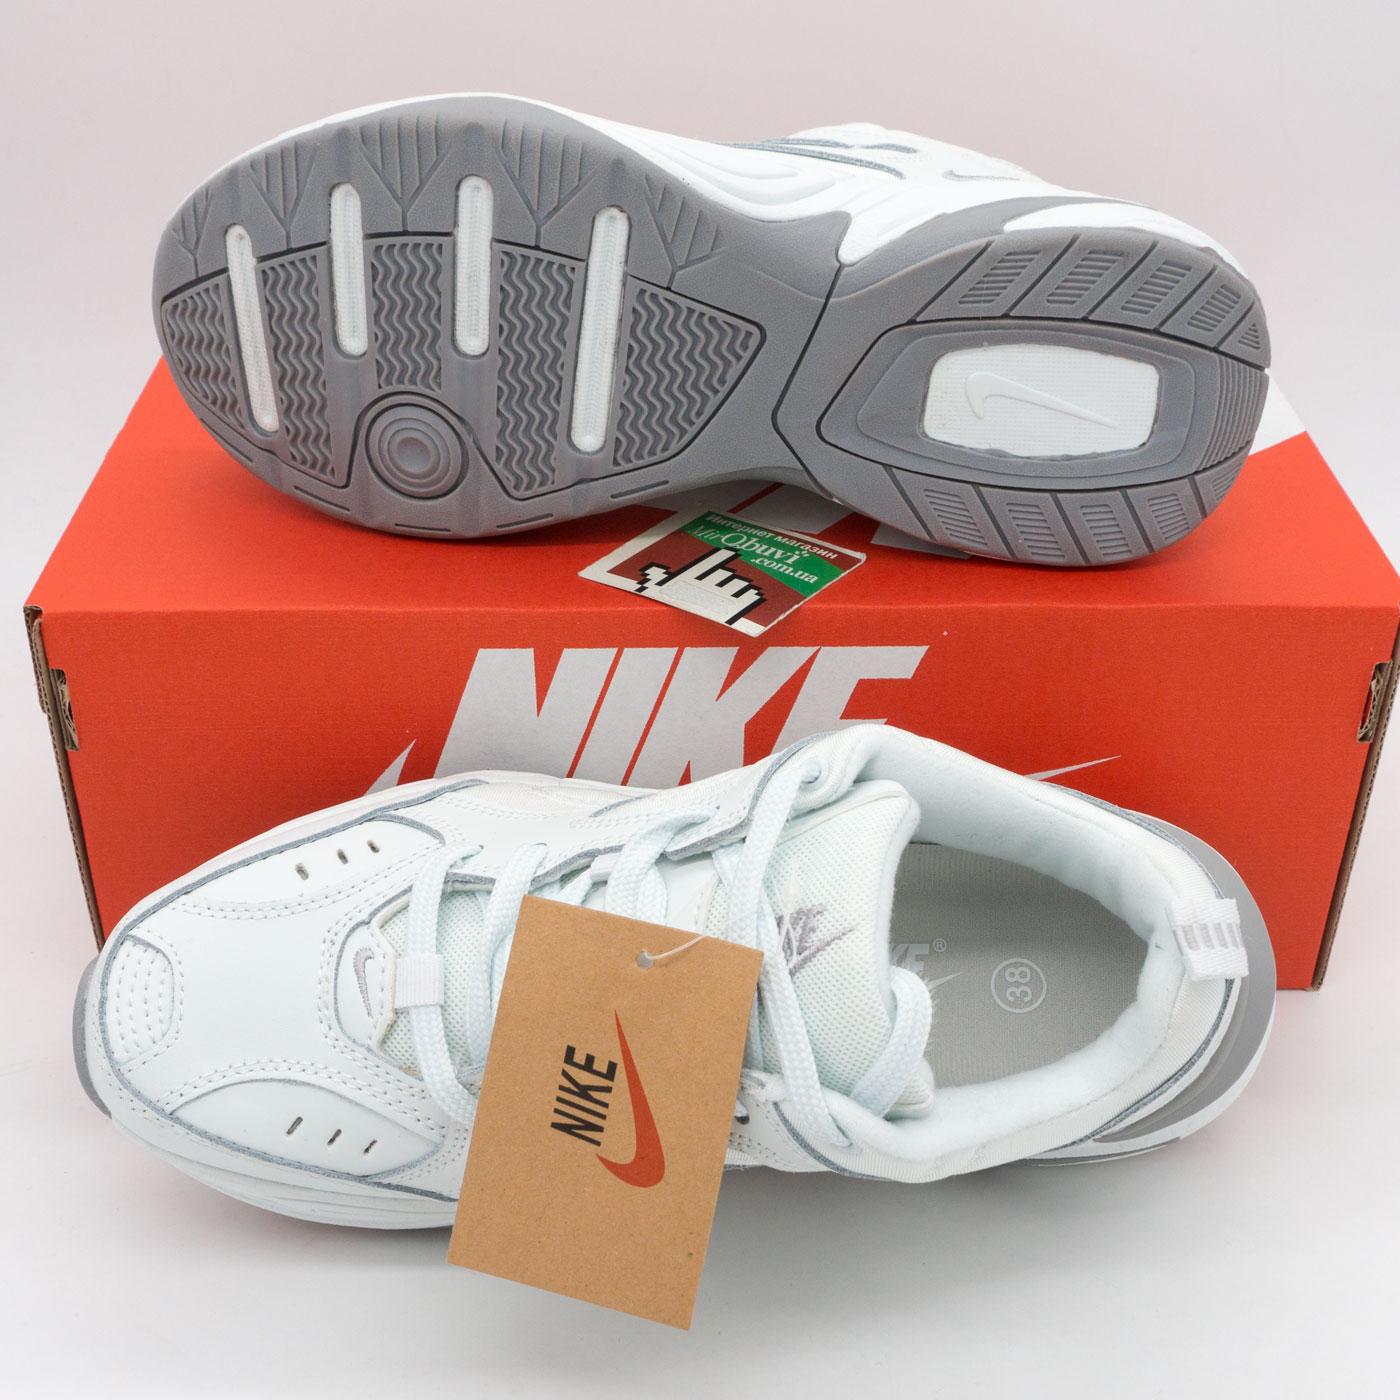 фото bottom Кроссовки Nike M2K Tekno полностью белые bottom